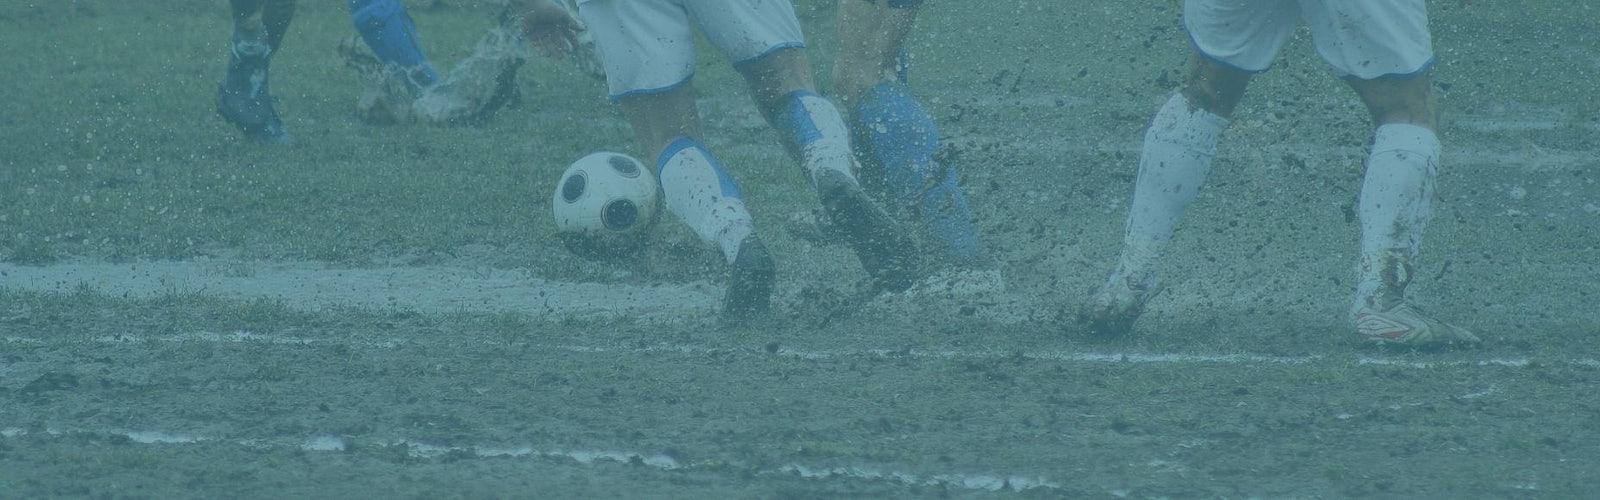 Soccer Betting Headline Image